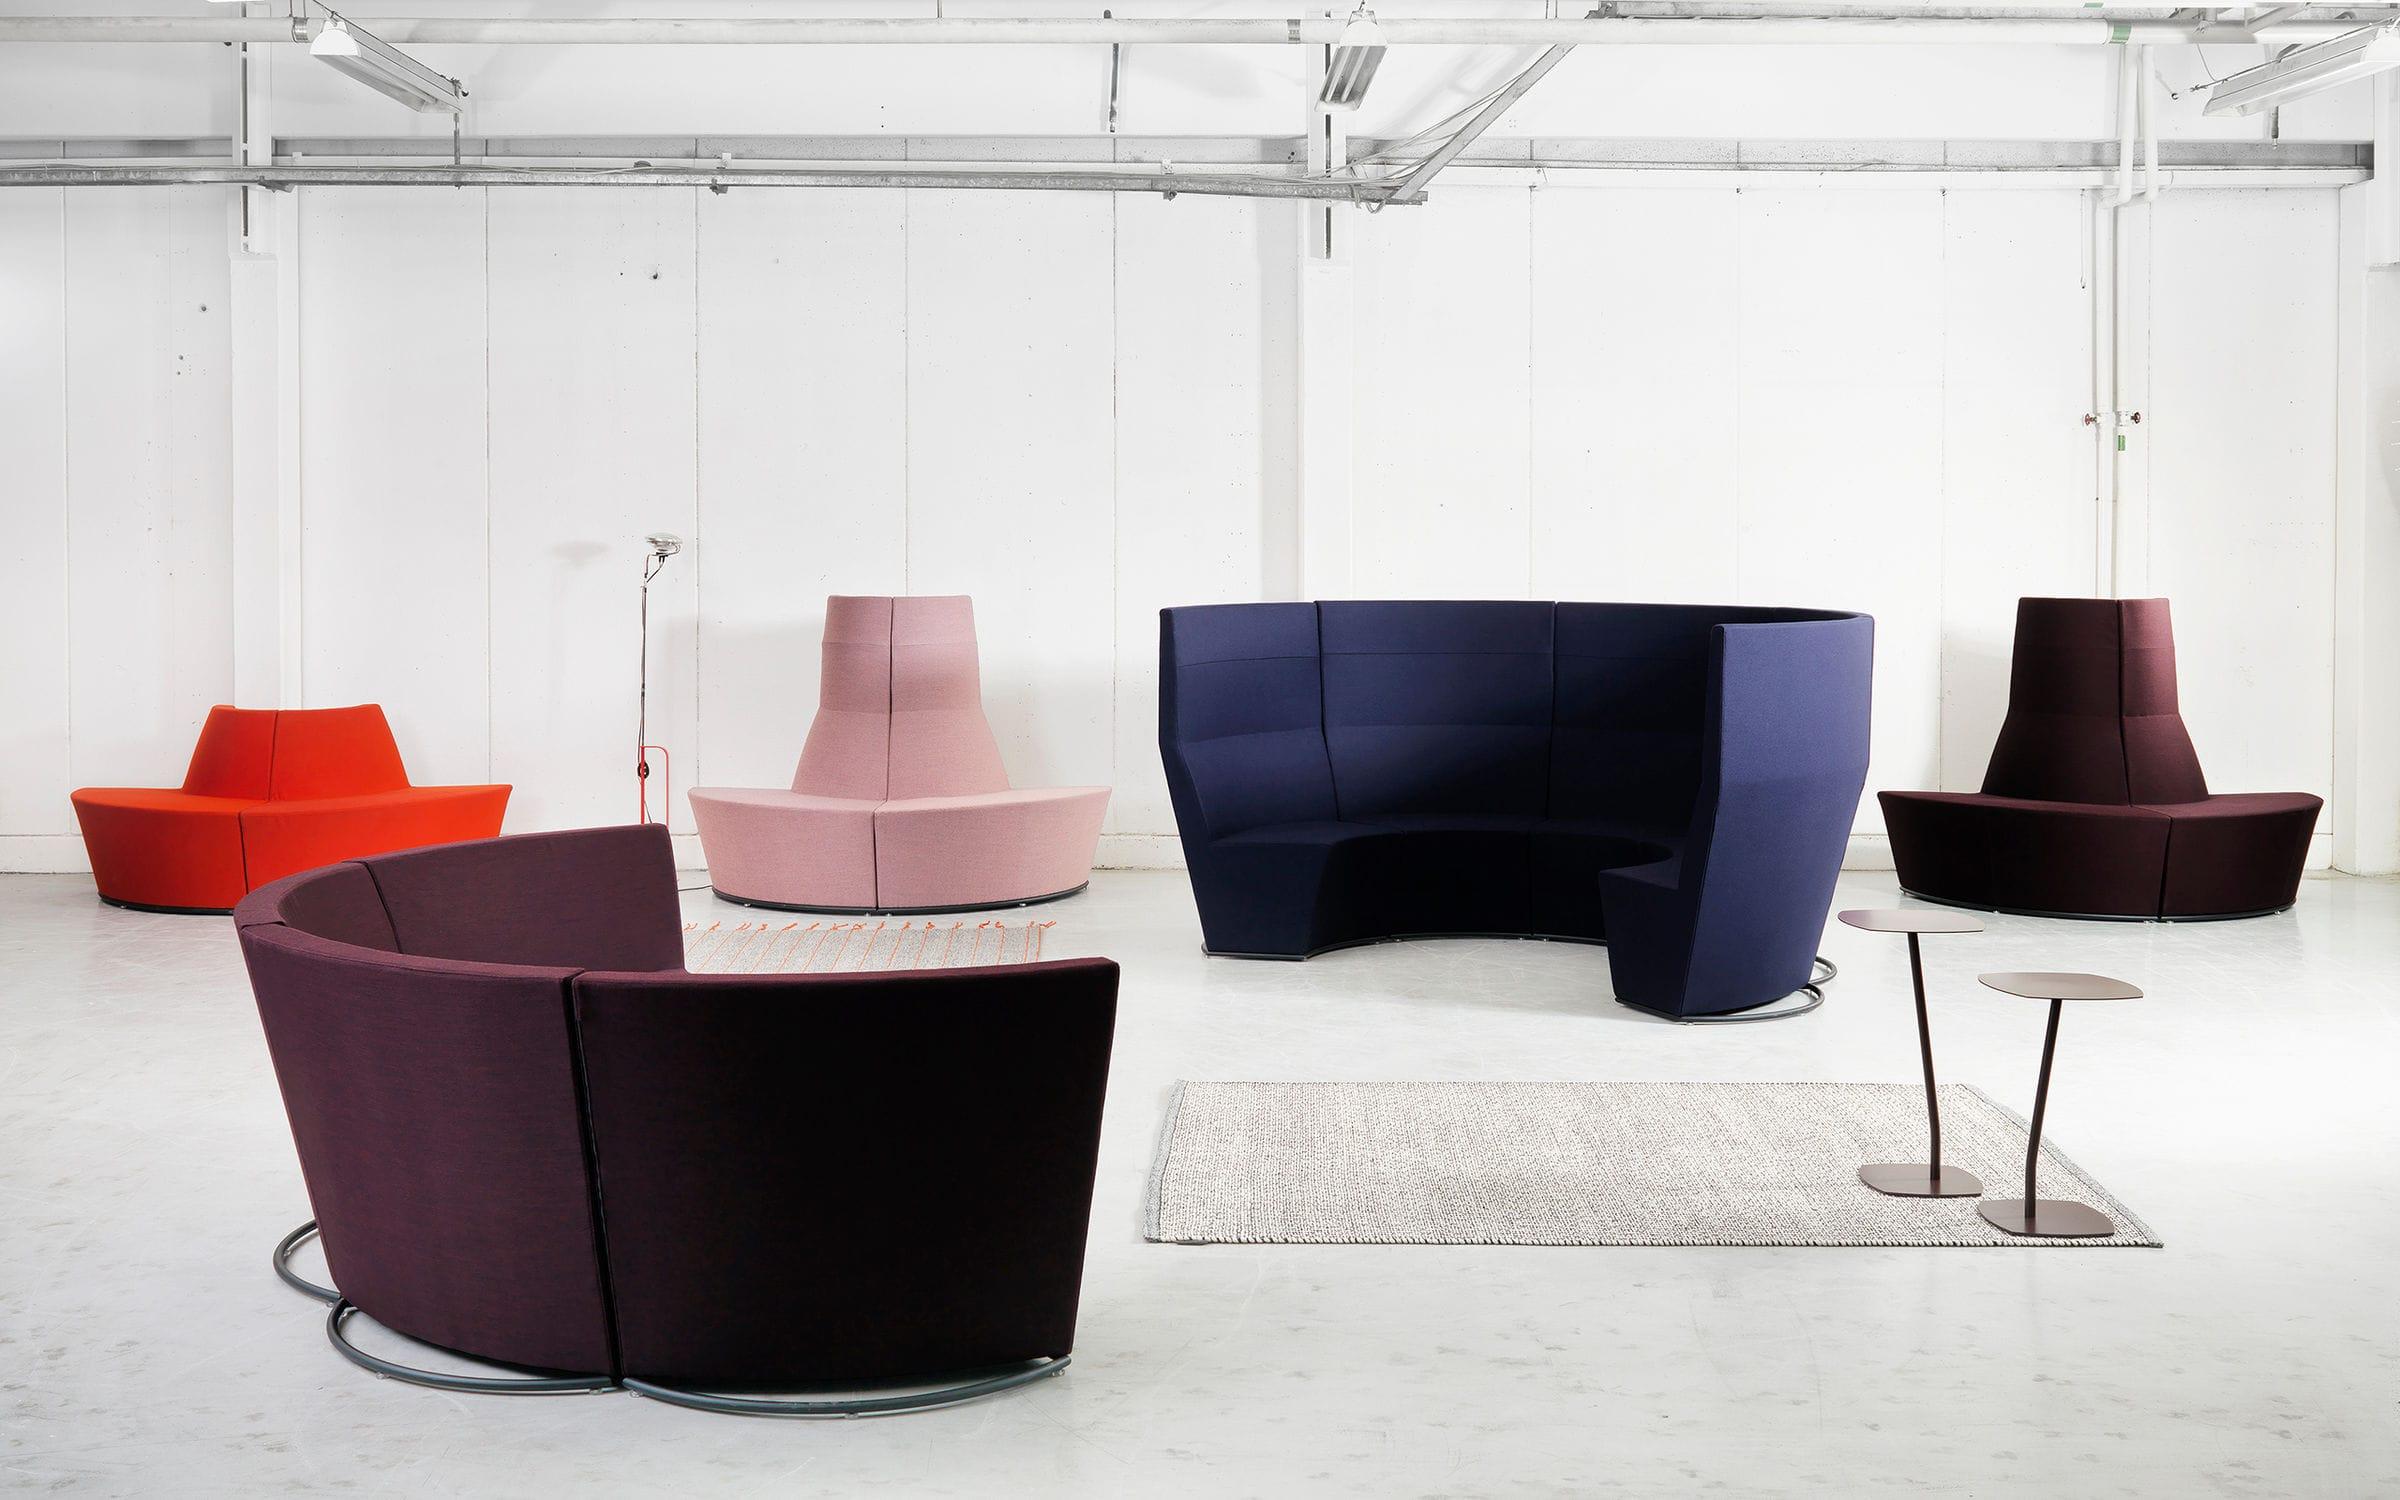 modular upholstered bench - area radius - lammhults möbel ab